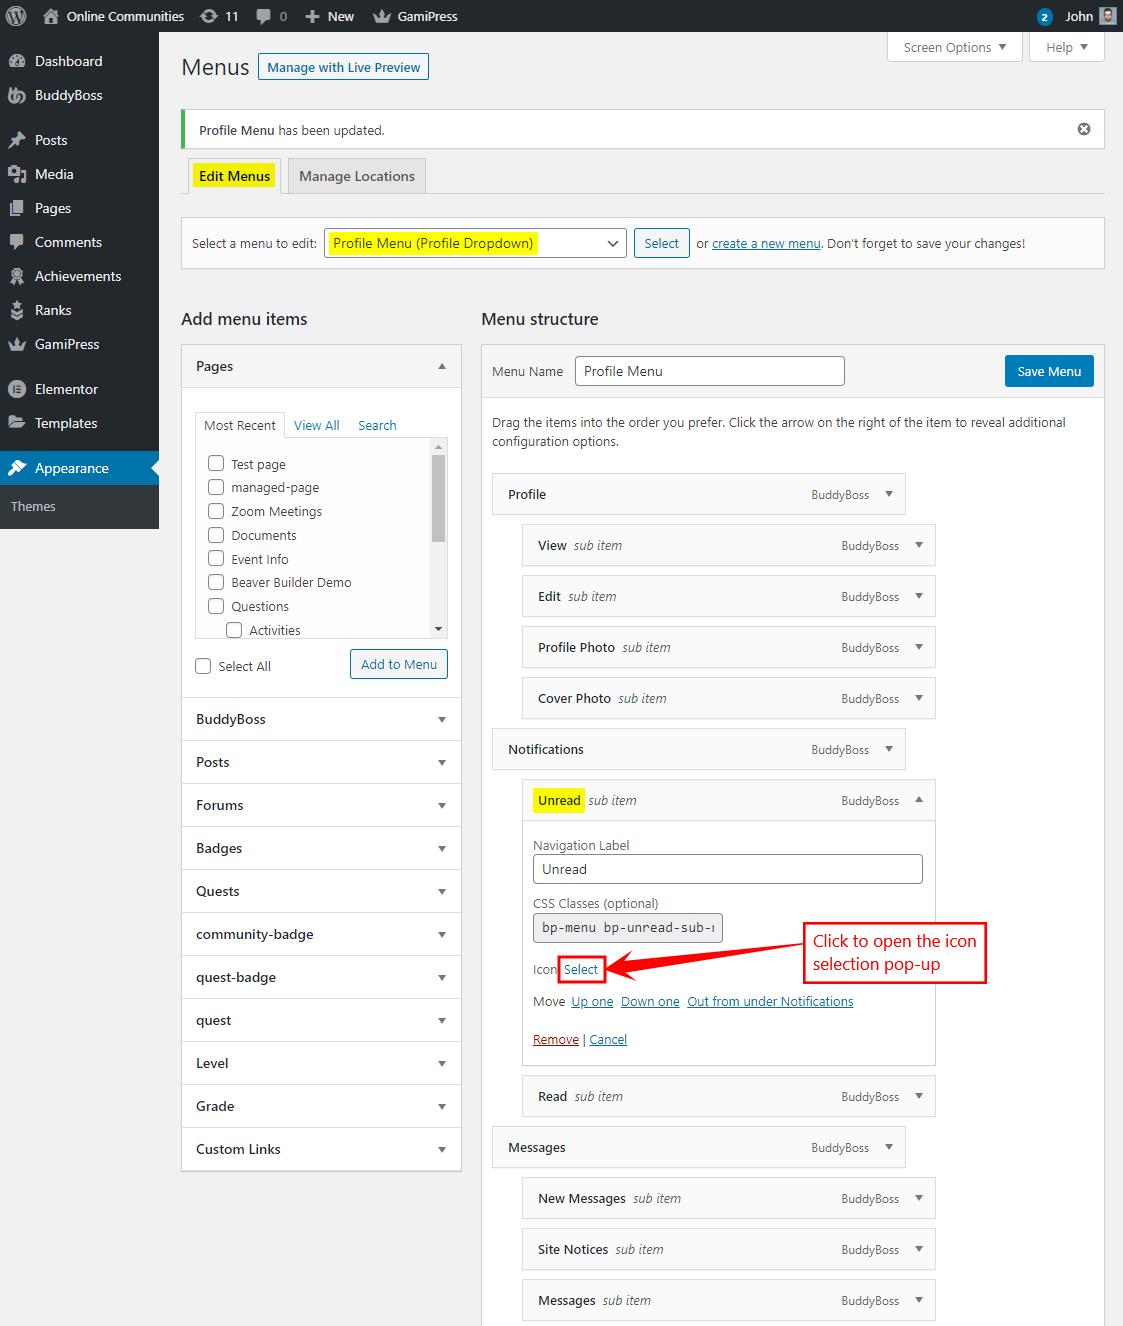 Profile Navigation Dropdown - Customizing the icon of a menu item